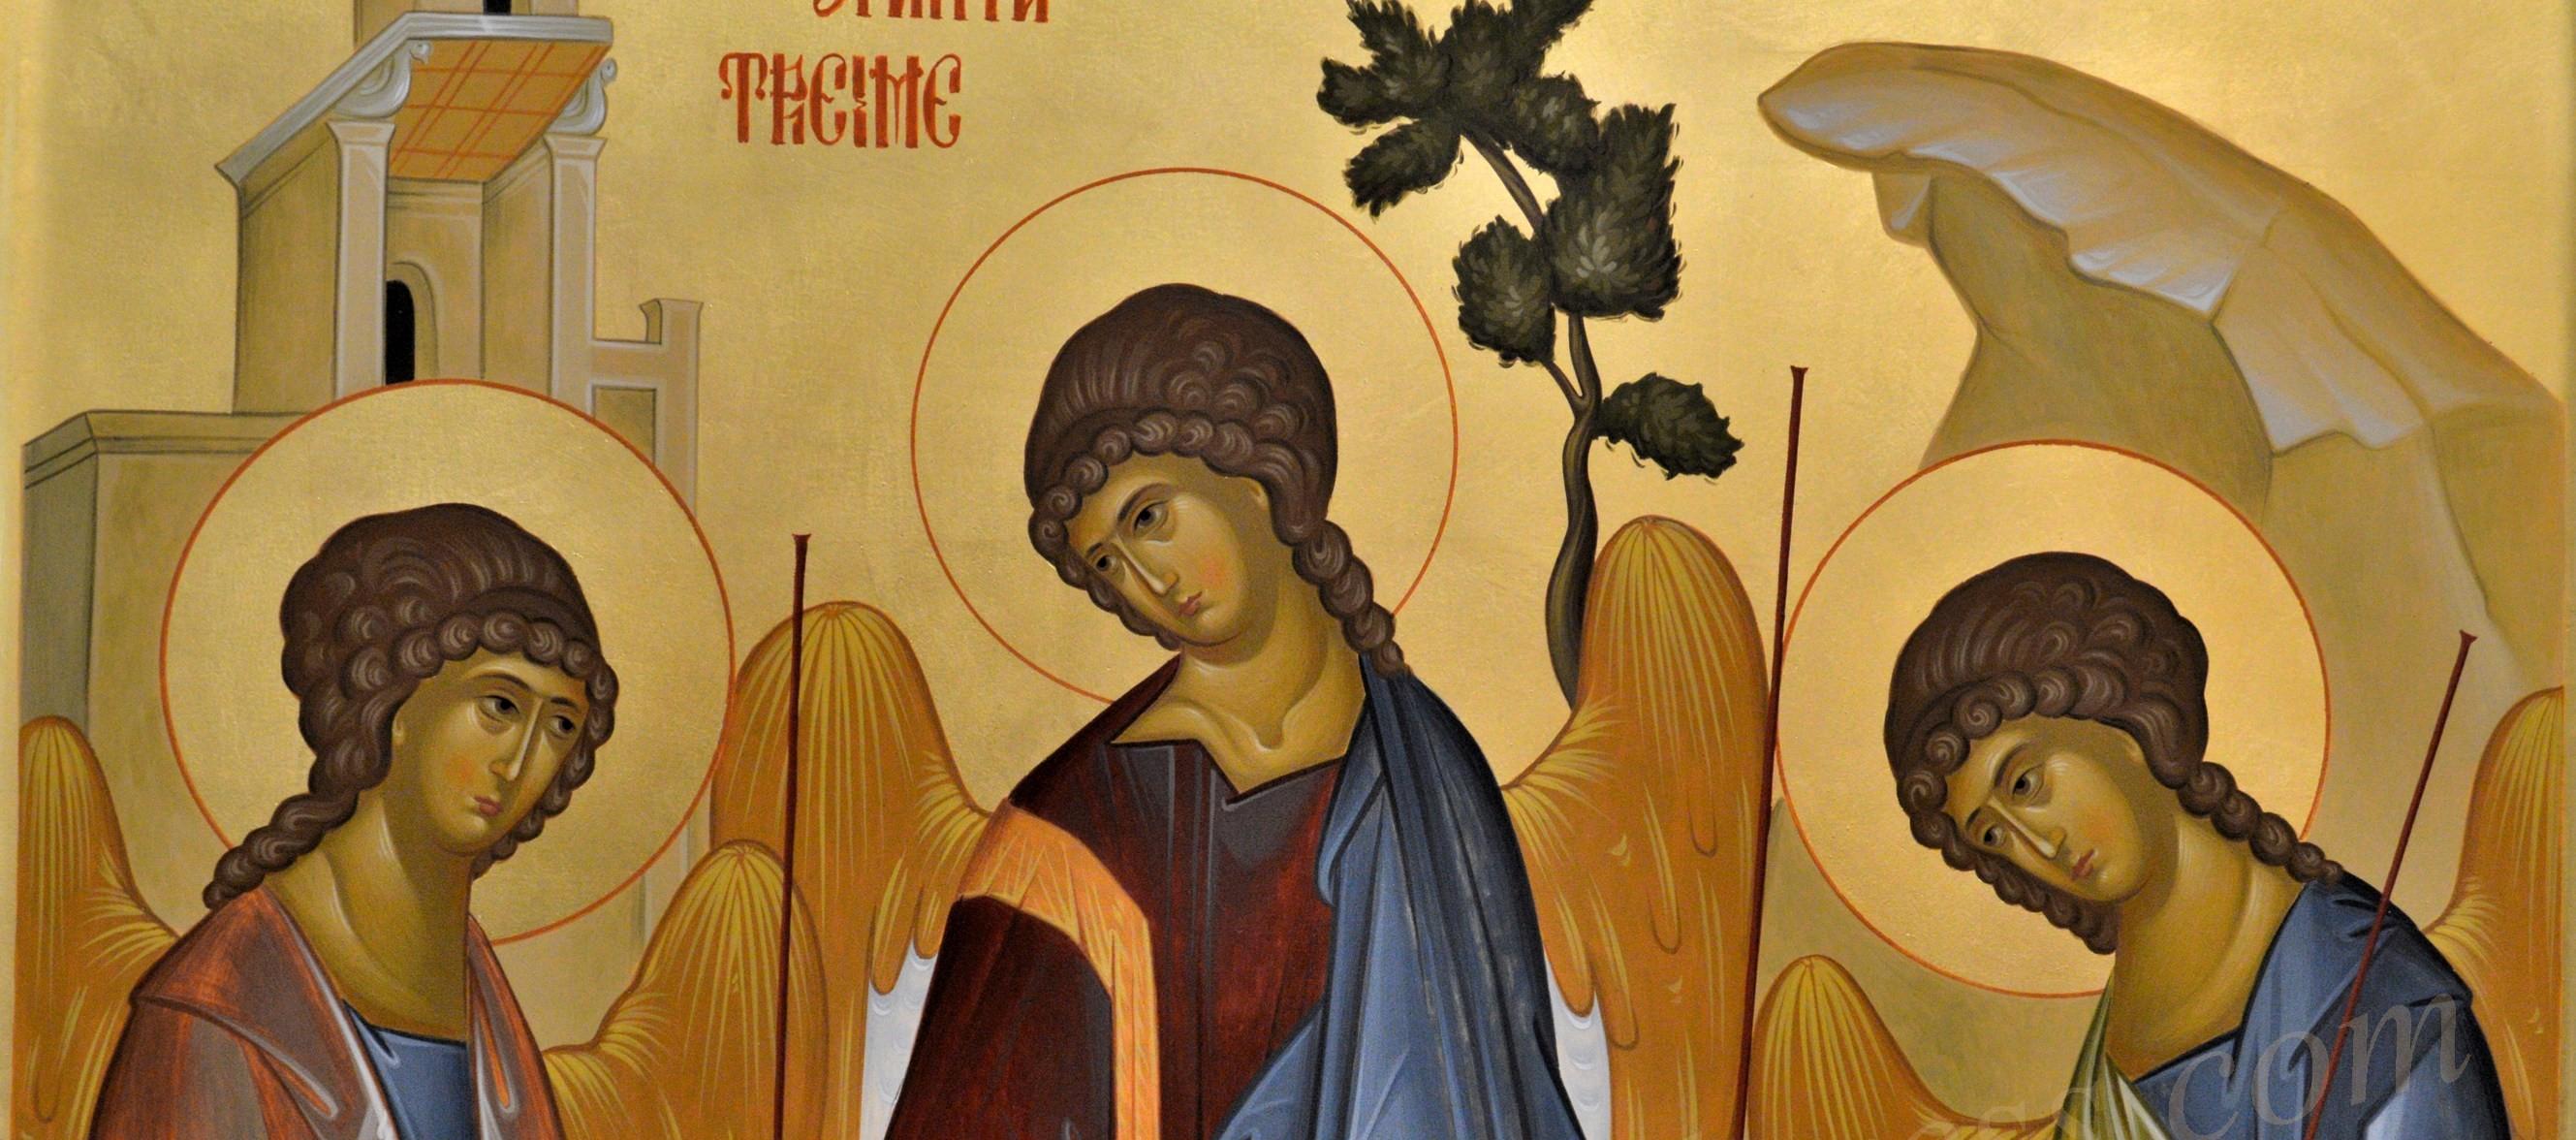 icon-of-the-holy-trinity-5.jpg